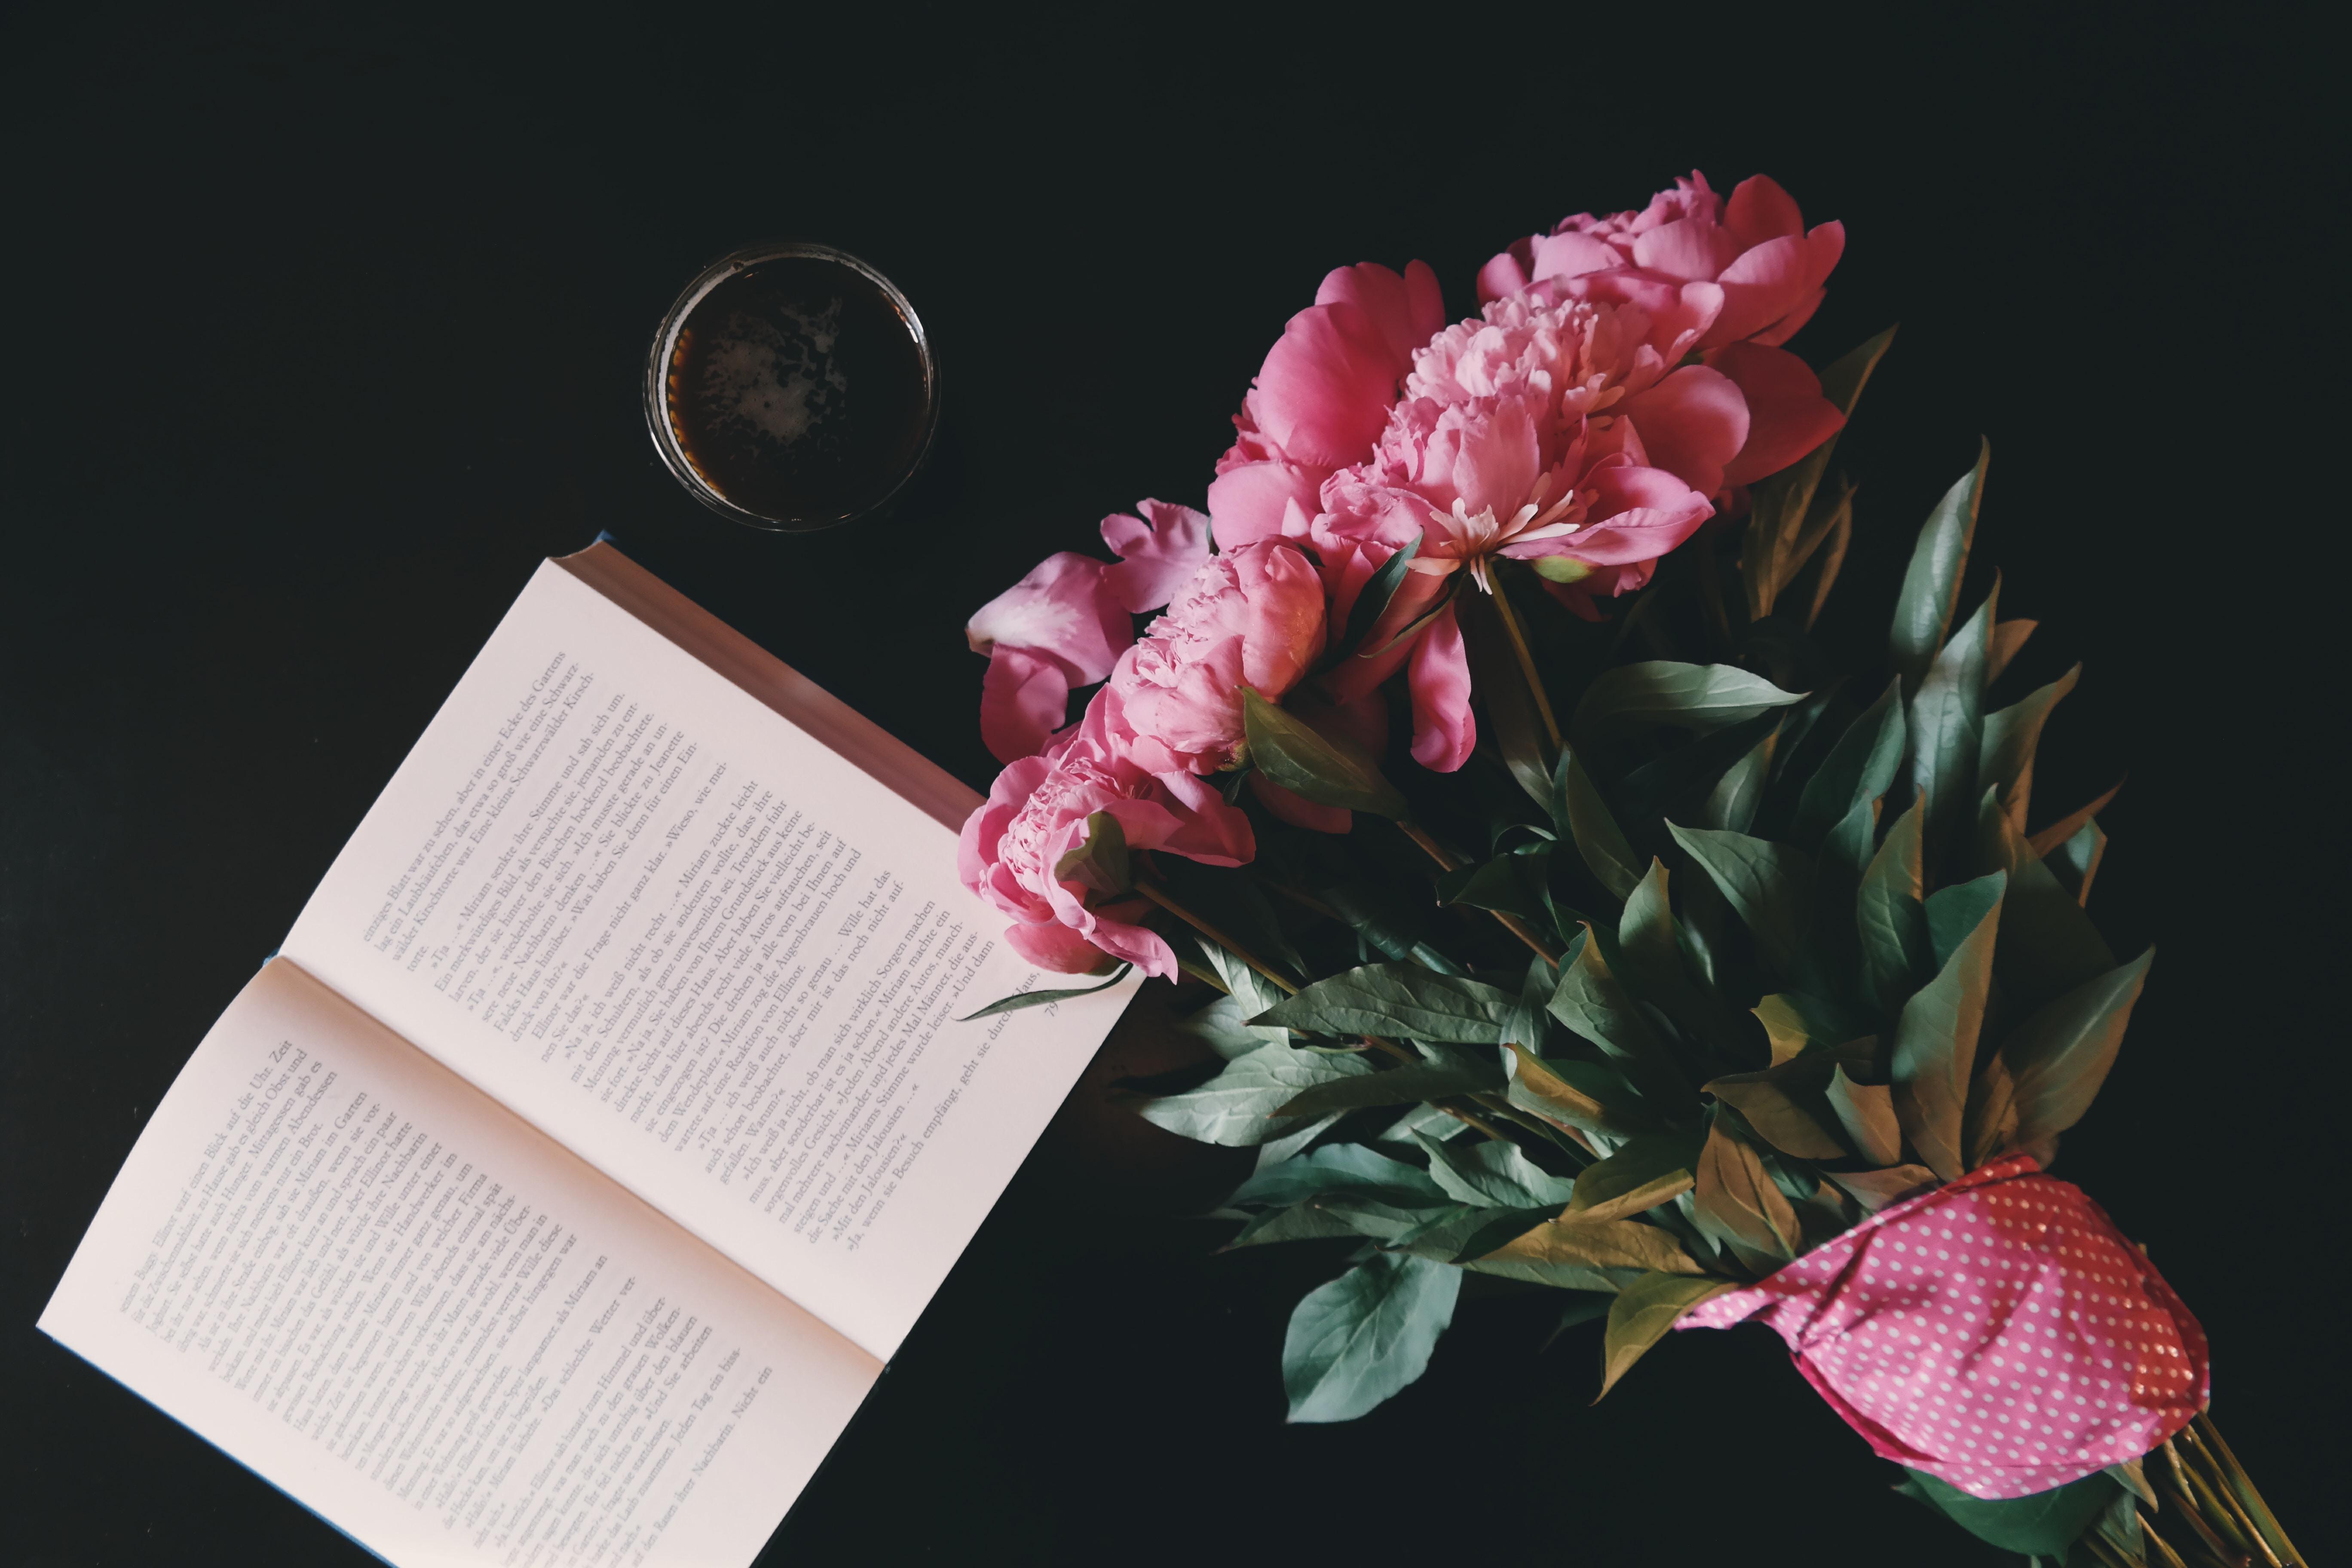 Best Flower Arranging Books in 2019